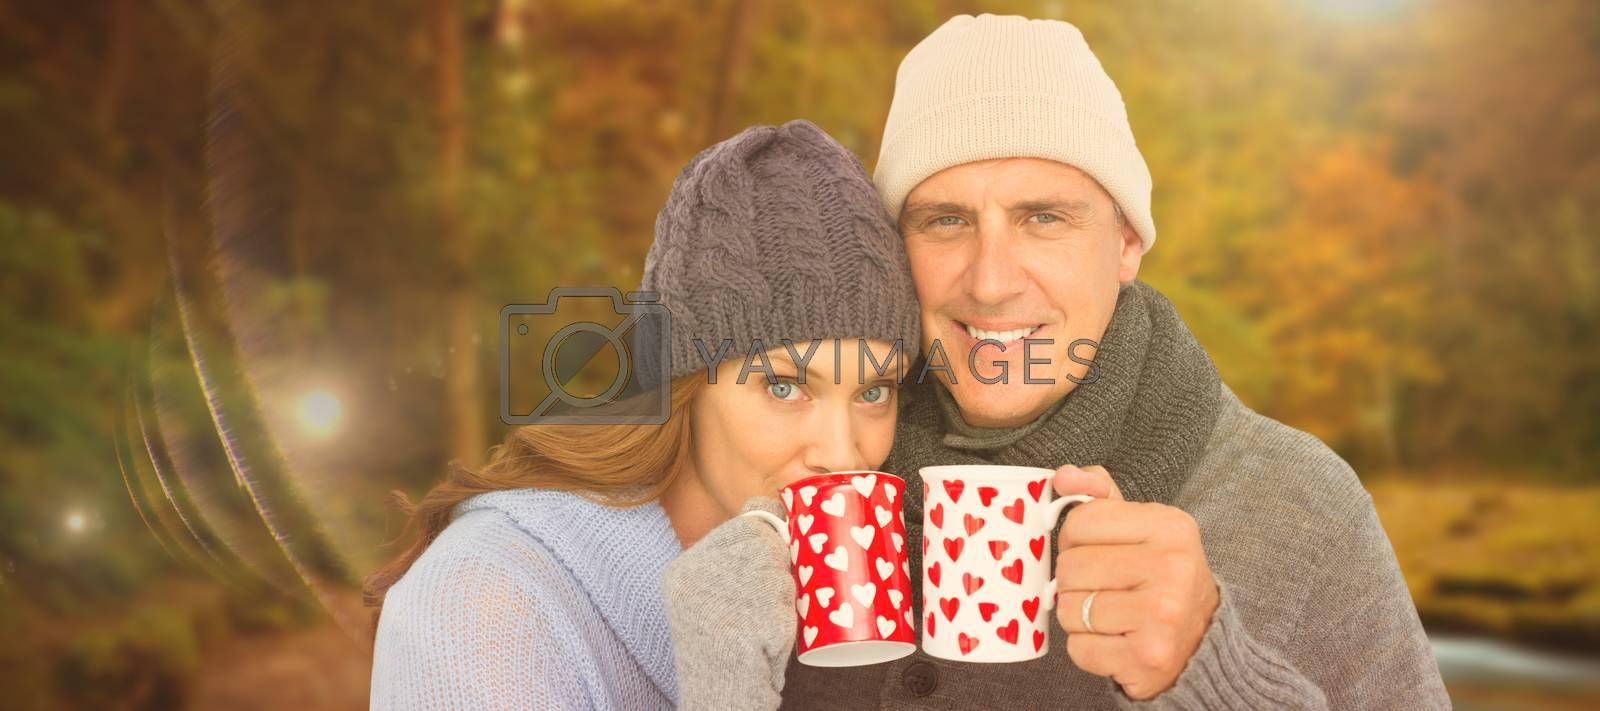 Happy couple in warm clothing holding mugs against autumn scene